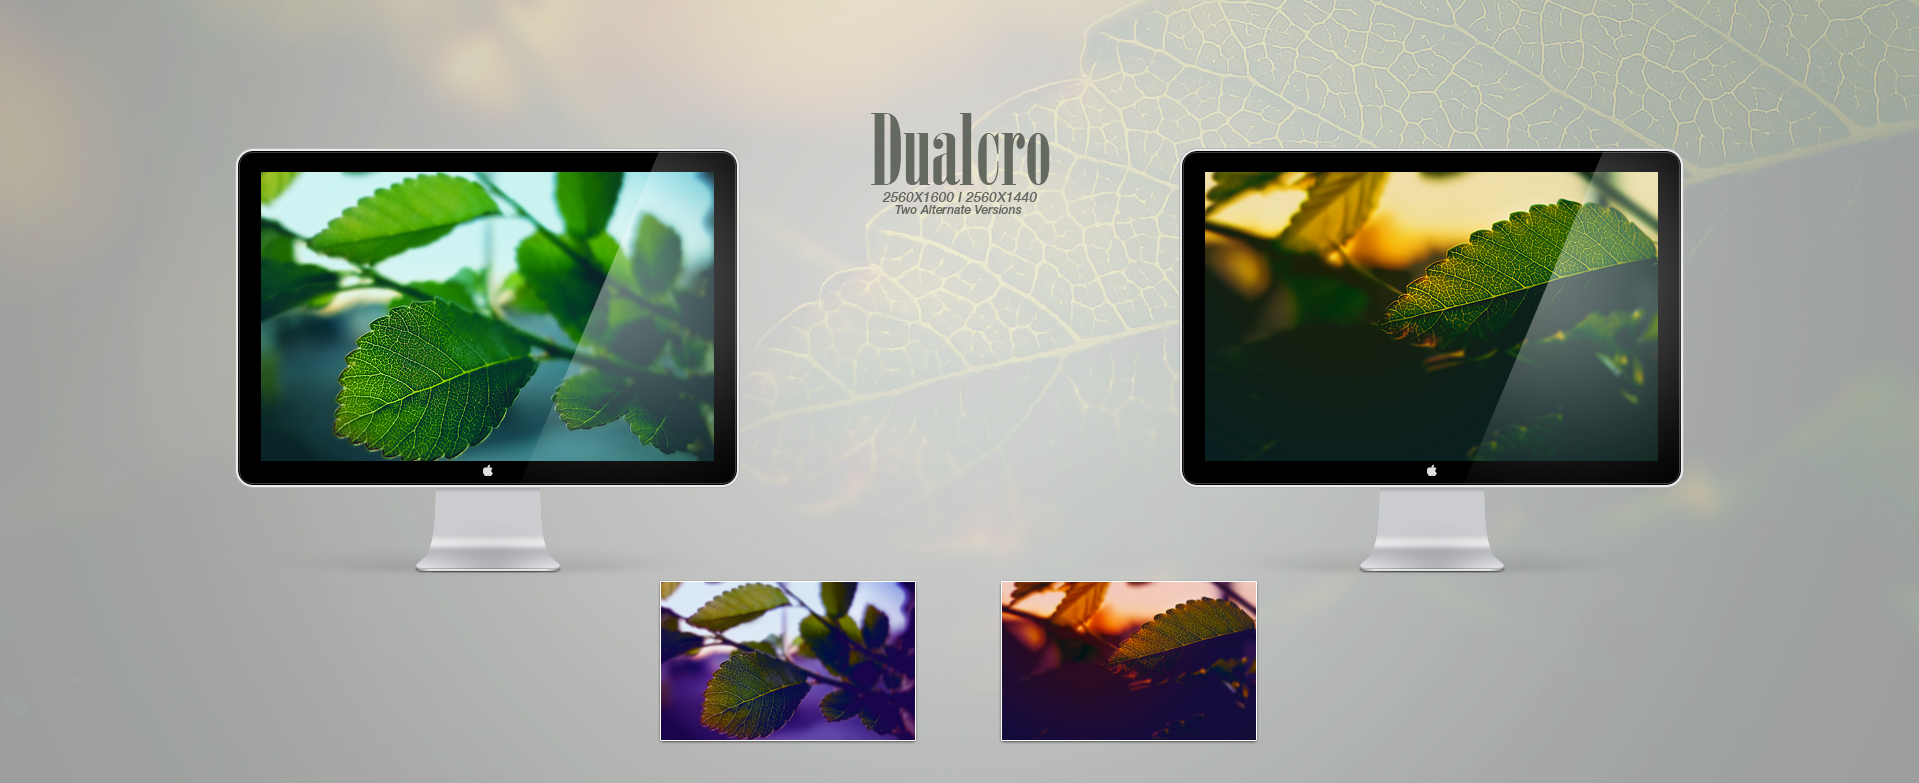 Dualcro by Delta909